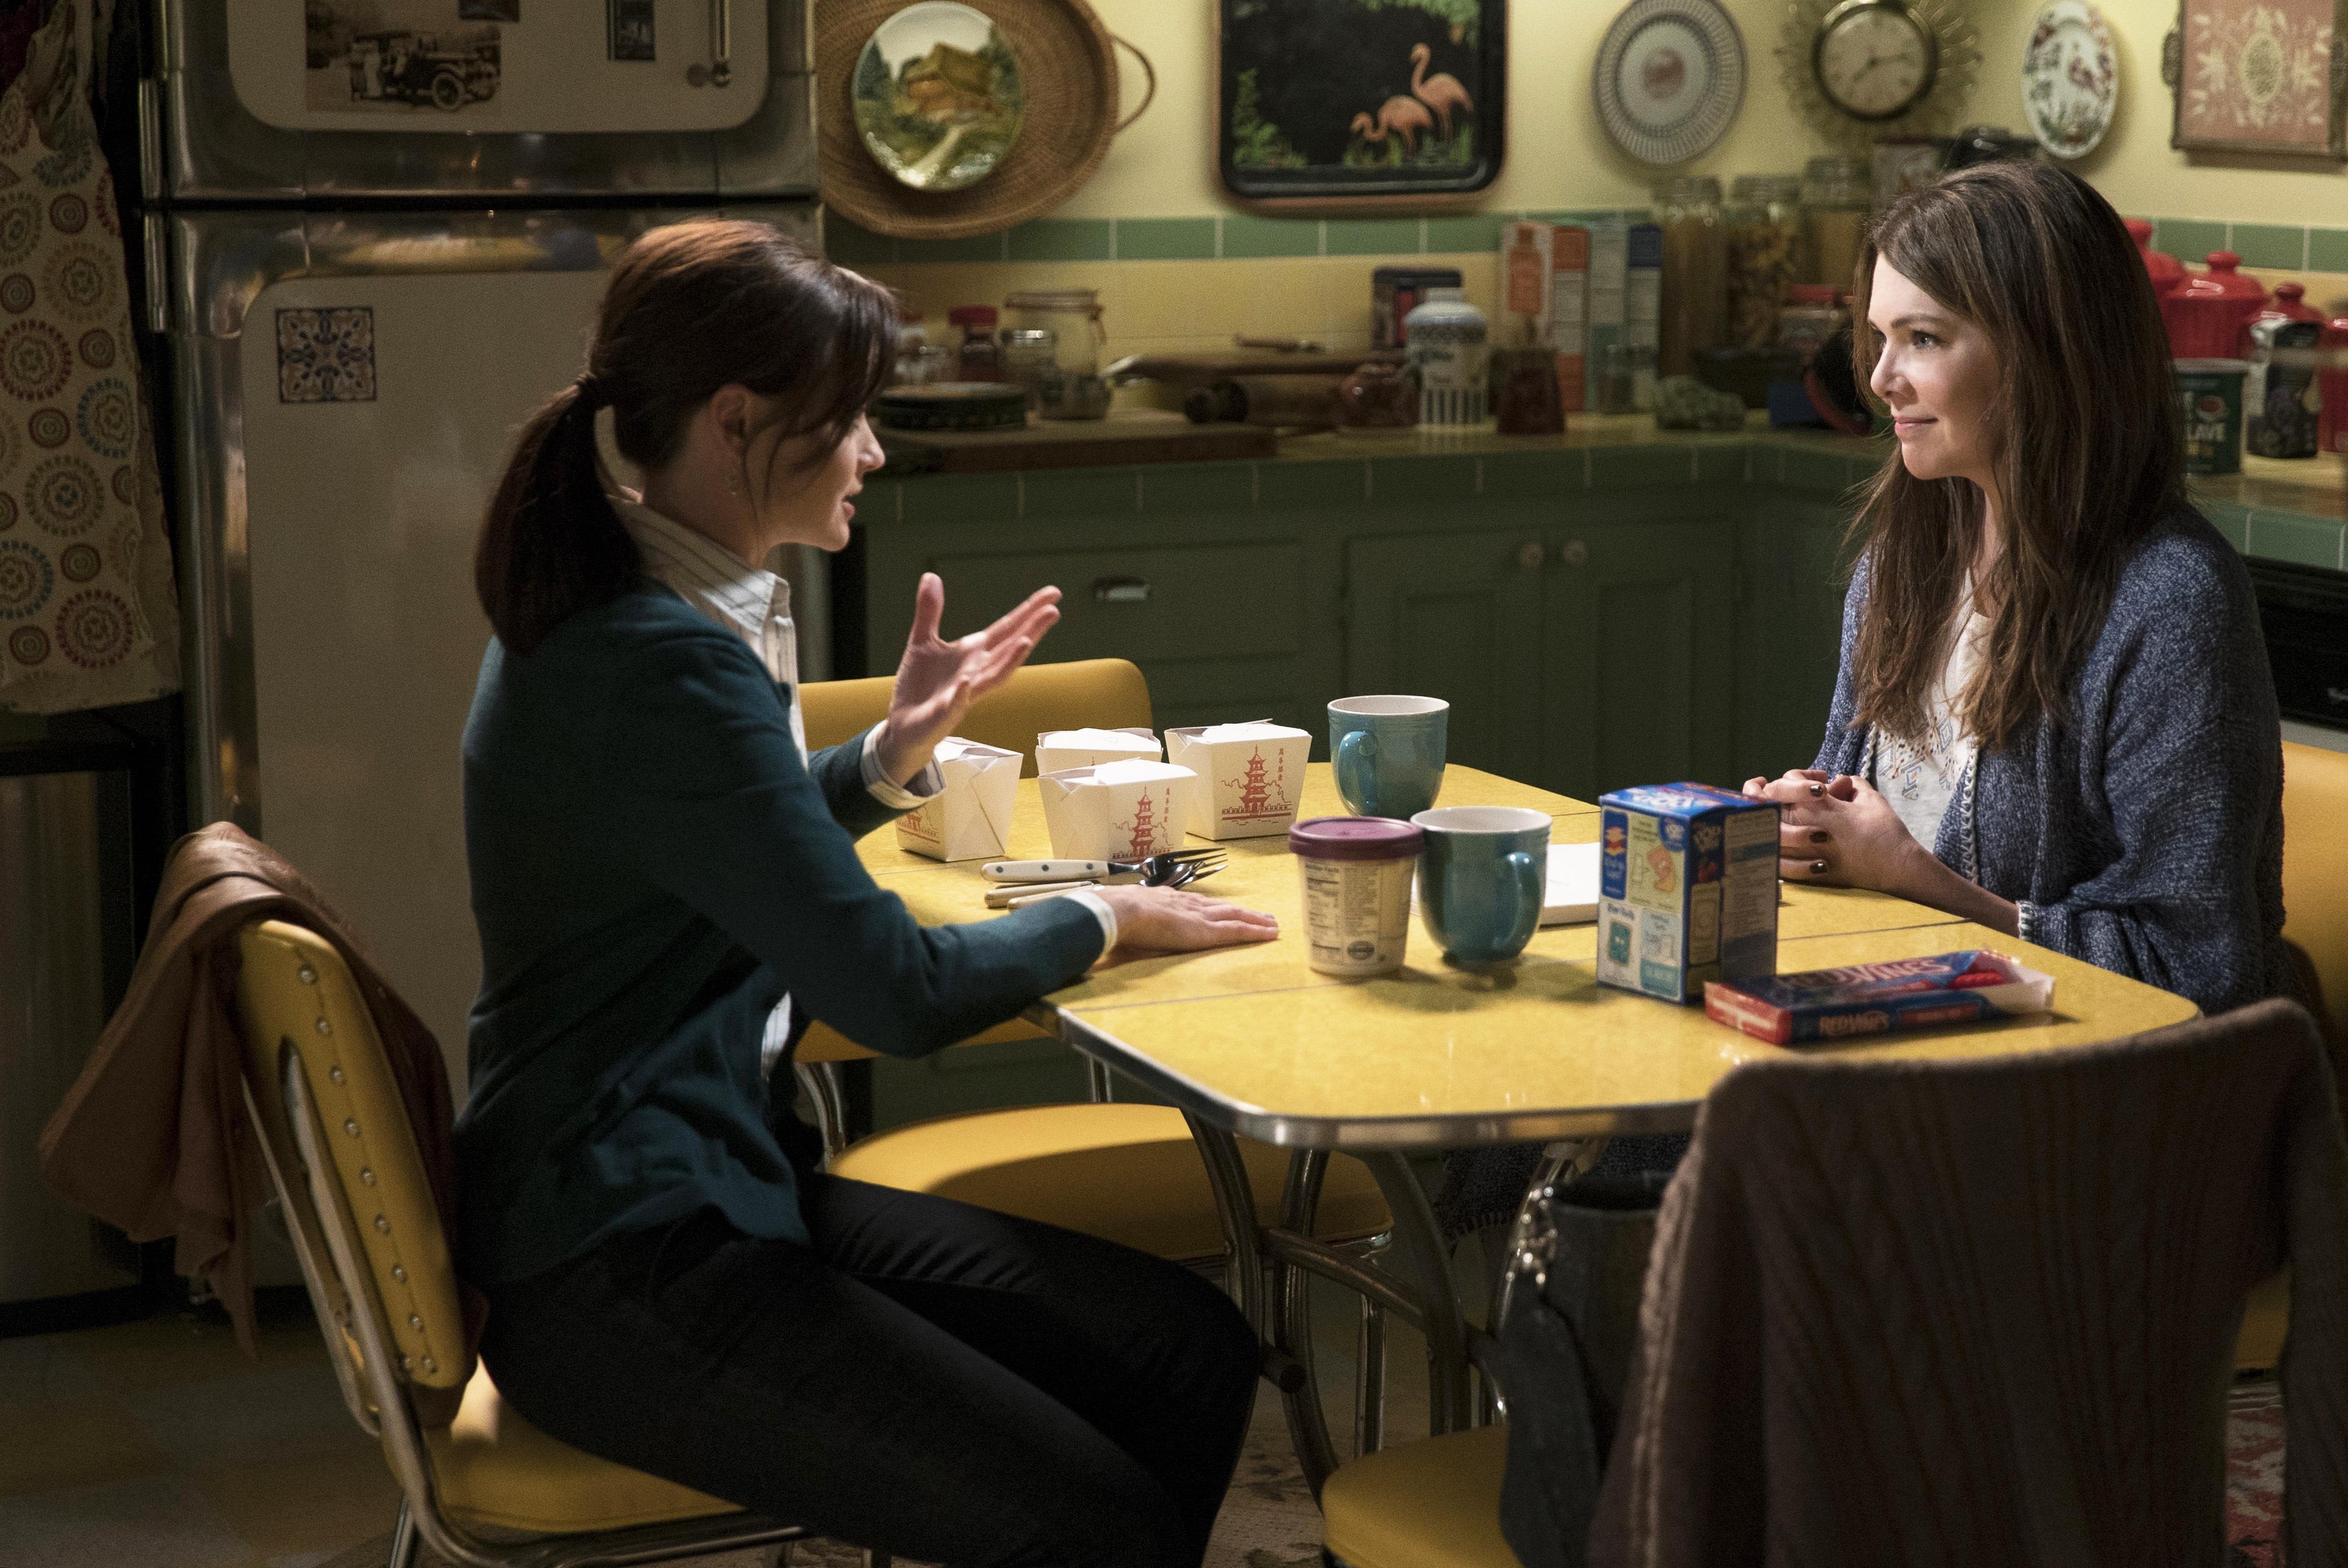 Alexis Bledel, as Rory Gilmore, and Lauren Graham, as Lorelai Gilmore.